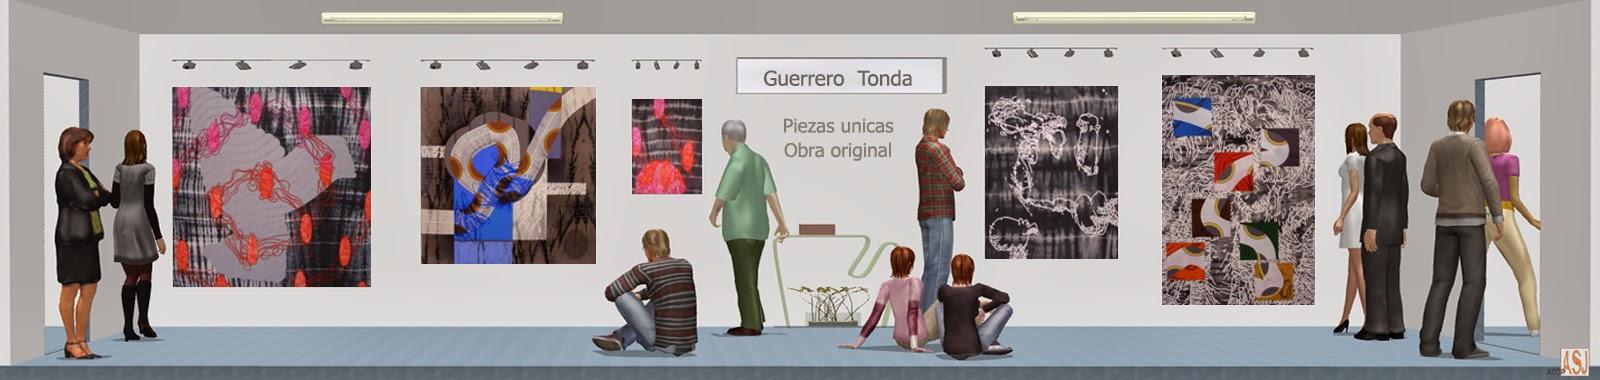 "<img src=""http://4.bp.blogspot.com/-AGY0towr1ho/Uvz0T_V41SI/AAAAAAAAUyM/WAyYWniGhiE/s1600/sala_de_exposicion_de_guerrero_tonda.jpg"" alt=""Sala de Exposición virtual de pinturas de Guerrero Tonda""/>"